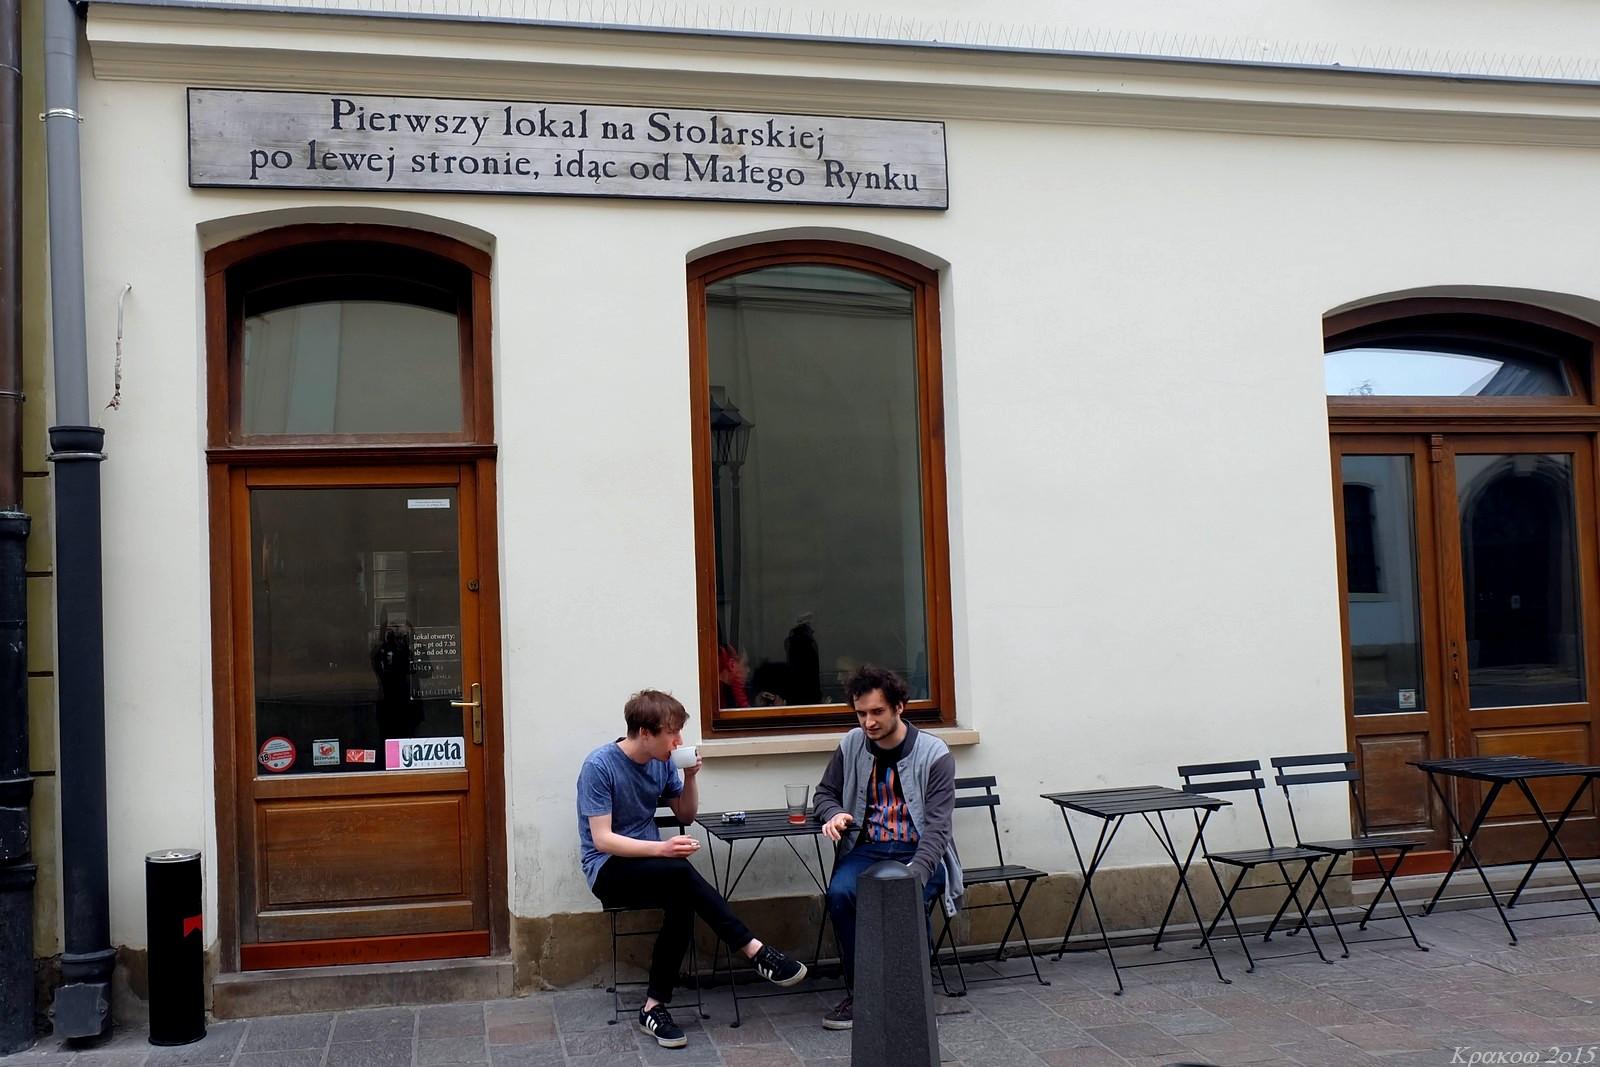 Stolarska, Krakow, Poland